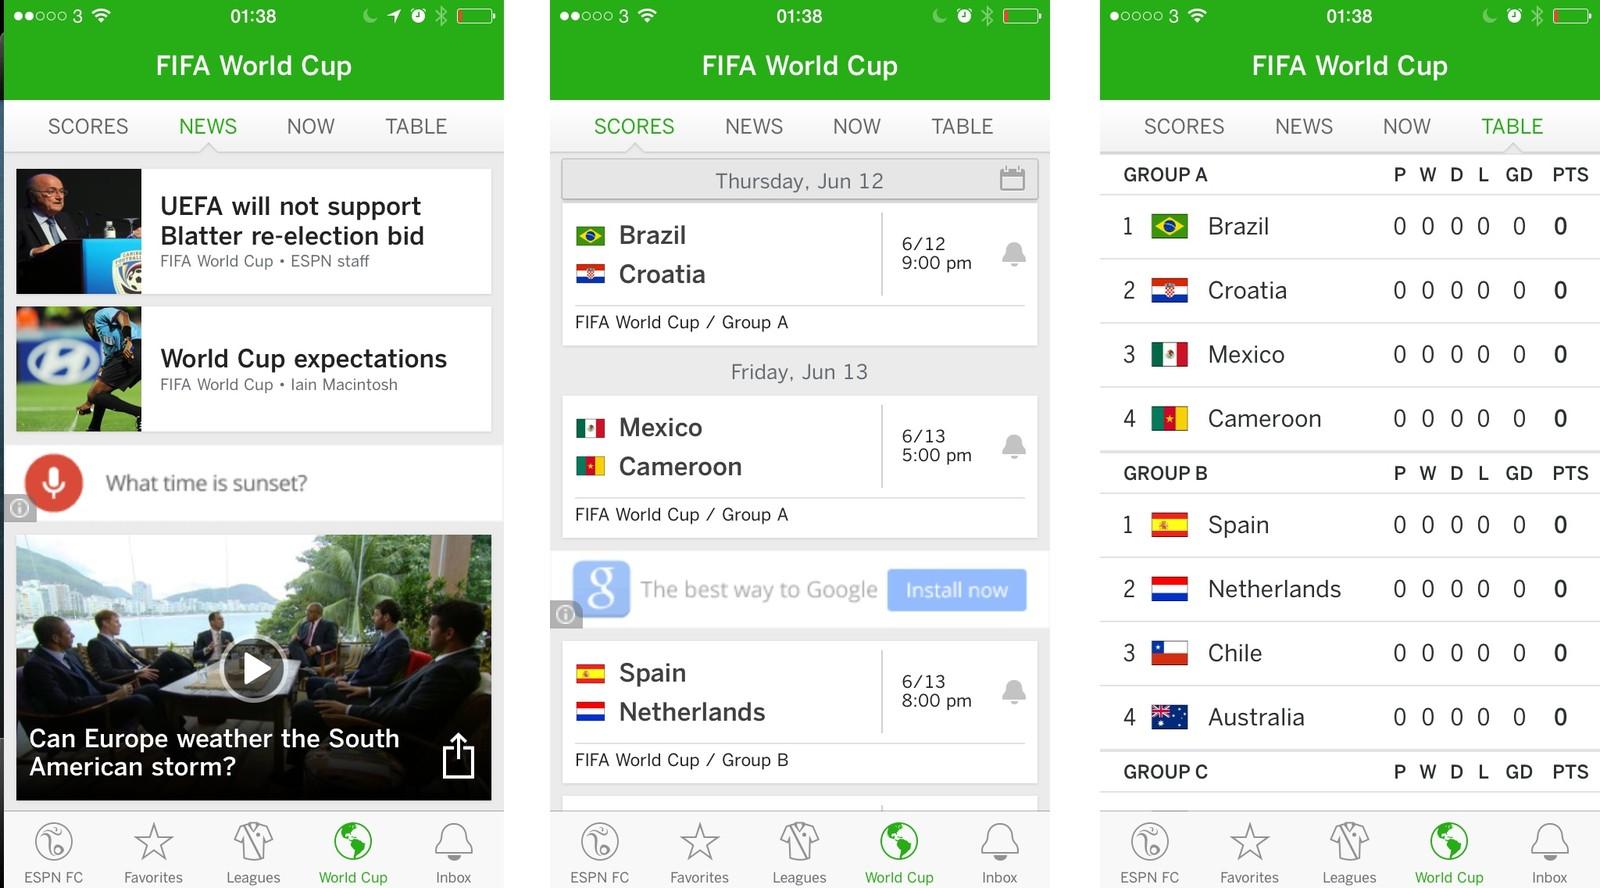 world_cup_apps_espnfc